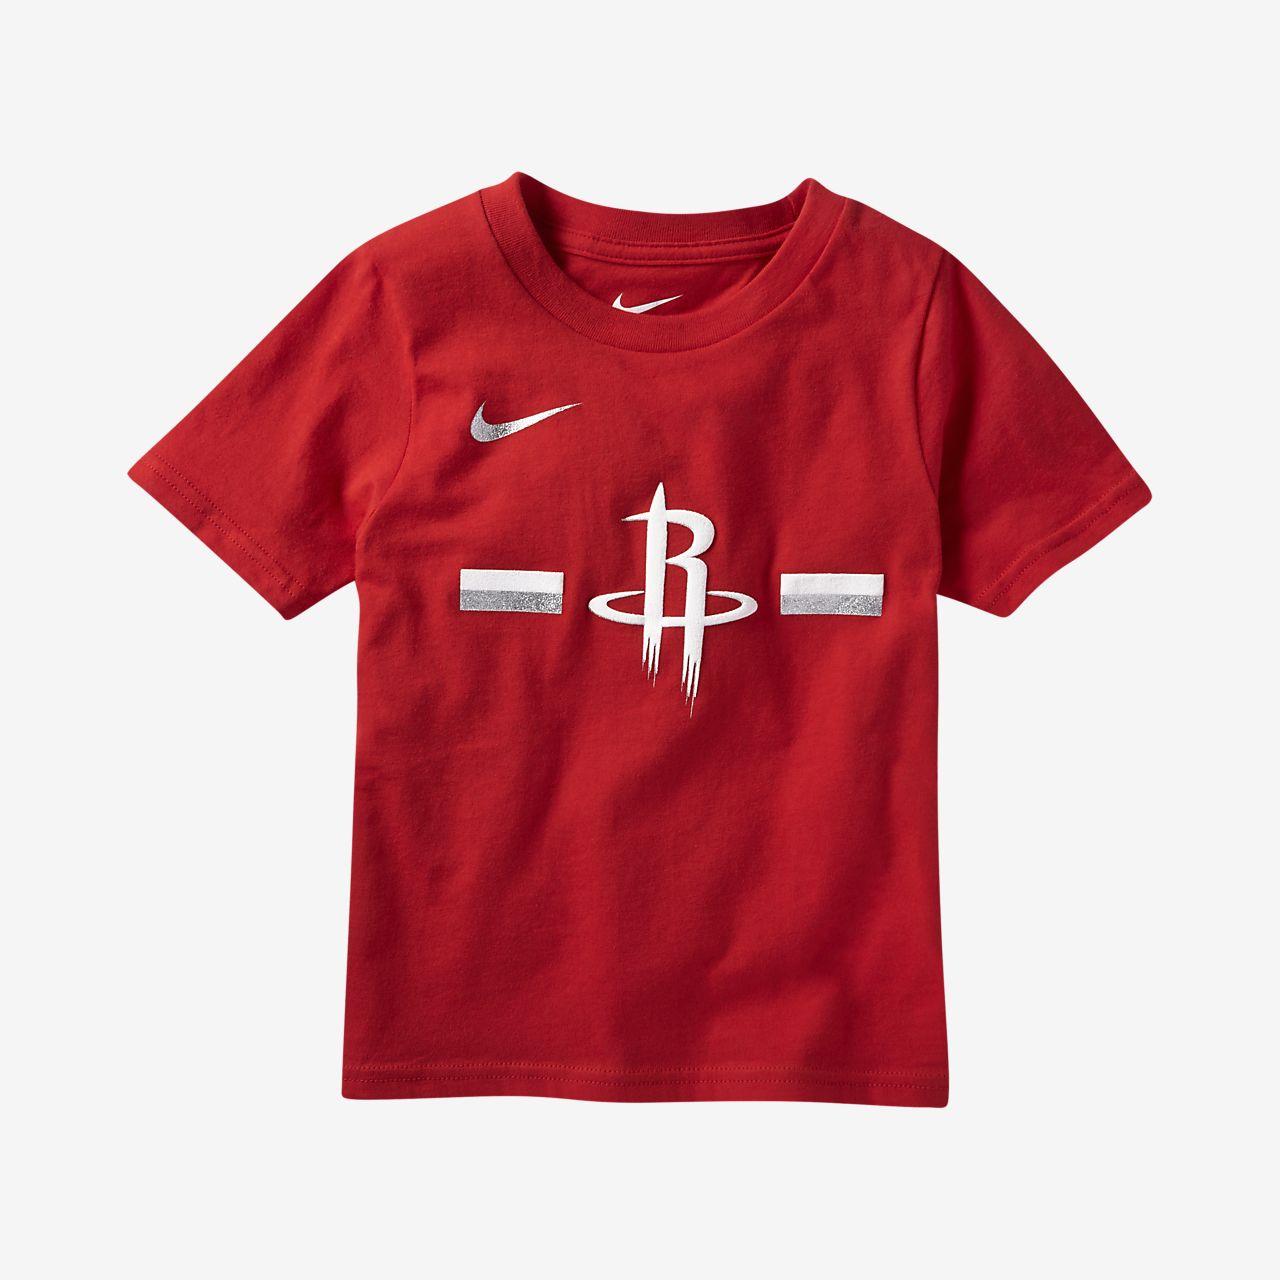 Houston Rockets Warm Up Shirt: Houston Rockets Nike Logo Toddler NBA T-Shirt. Nike.com